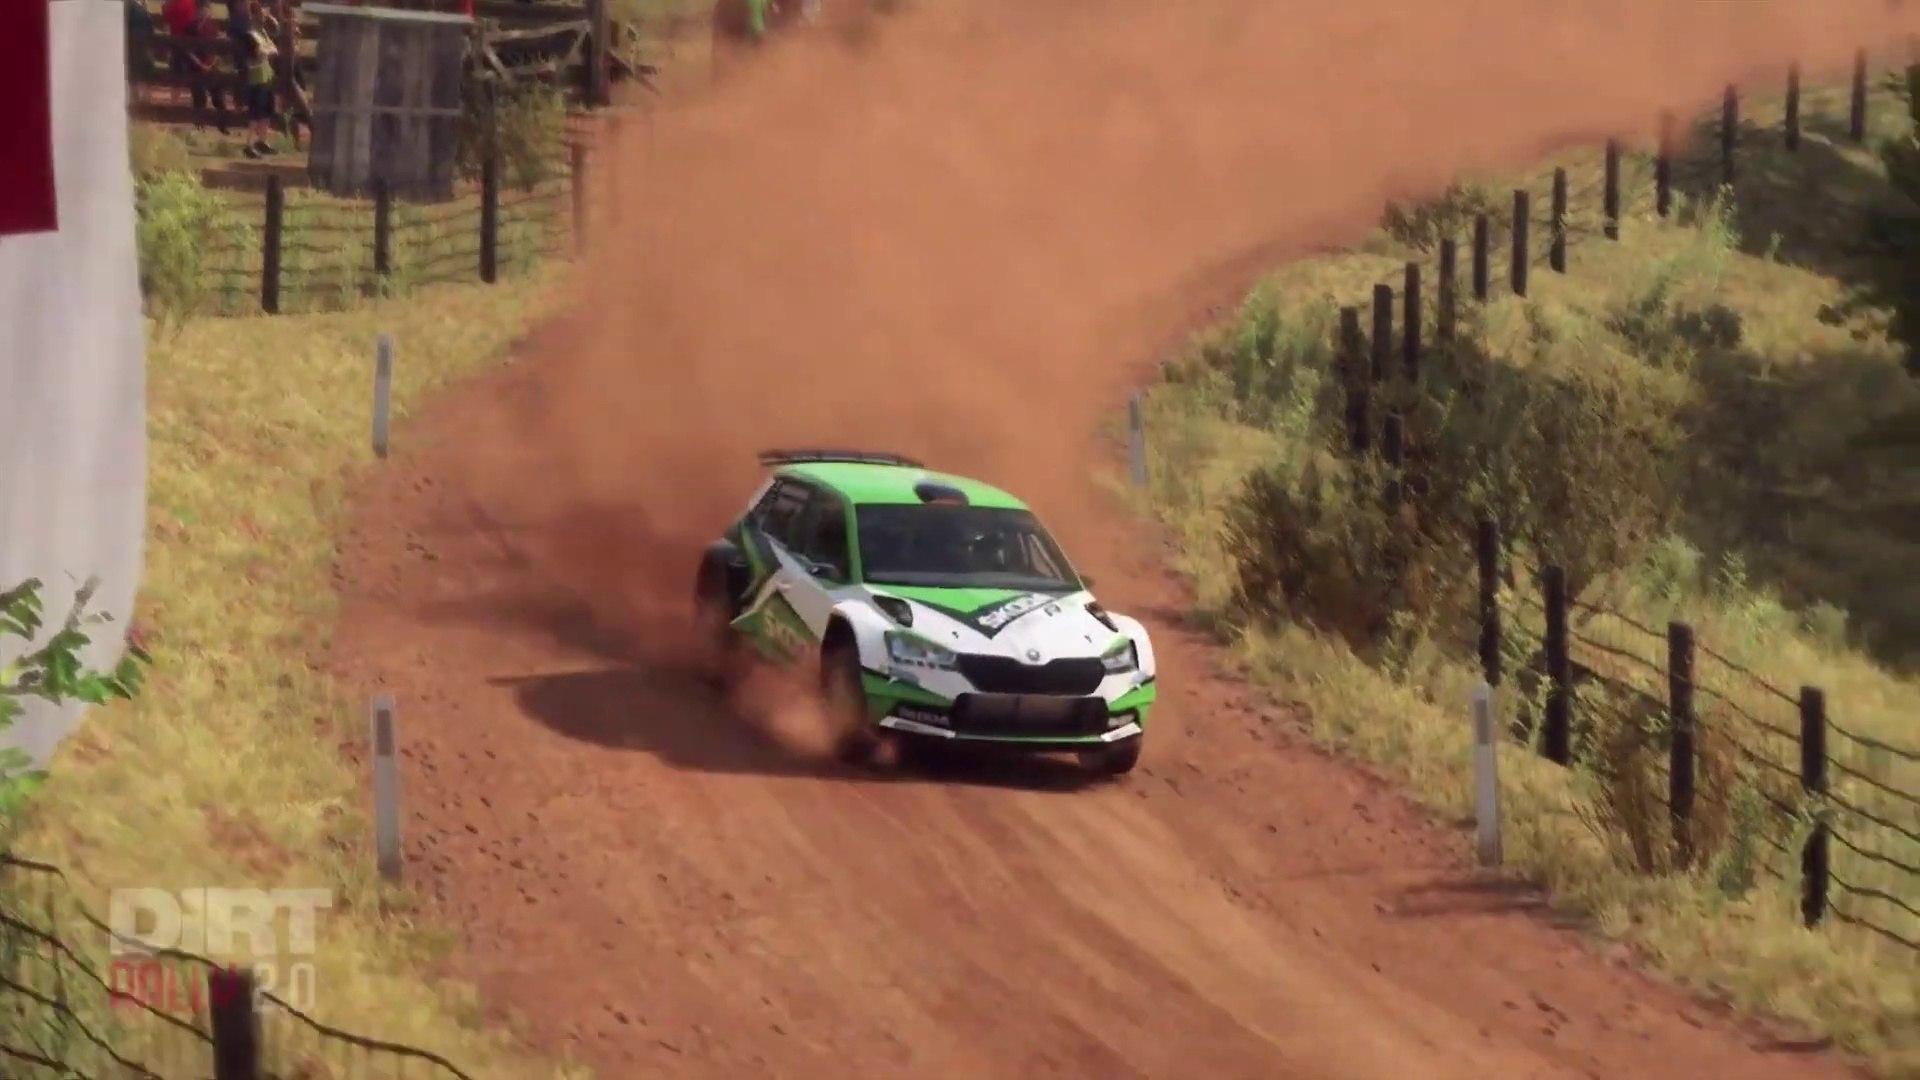 Skoda Fabia R5 Gameplay Dirt Rally 2 0 Game Video Dailymotion